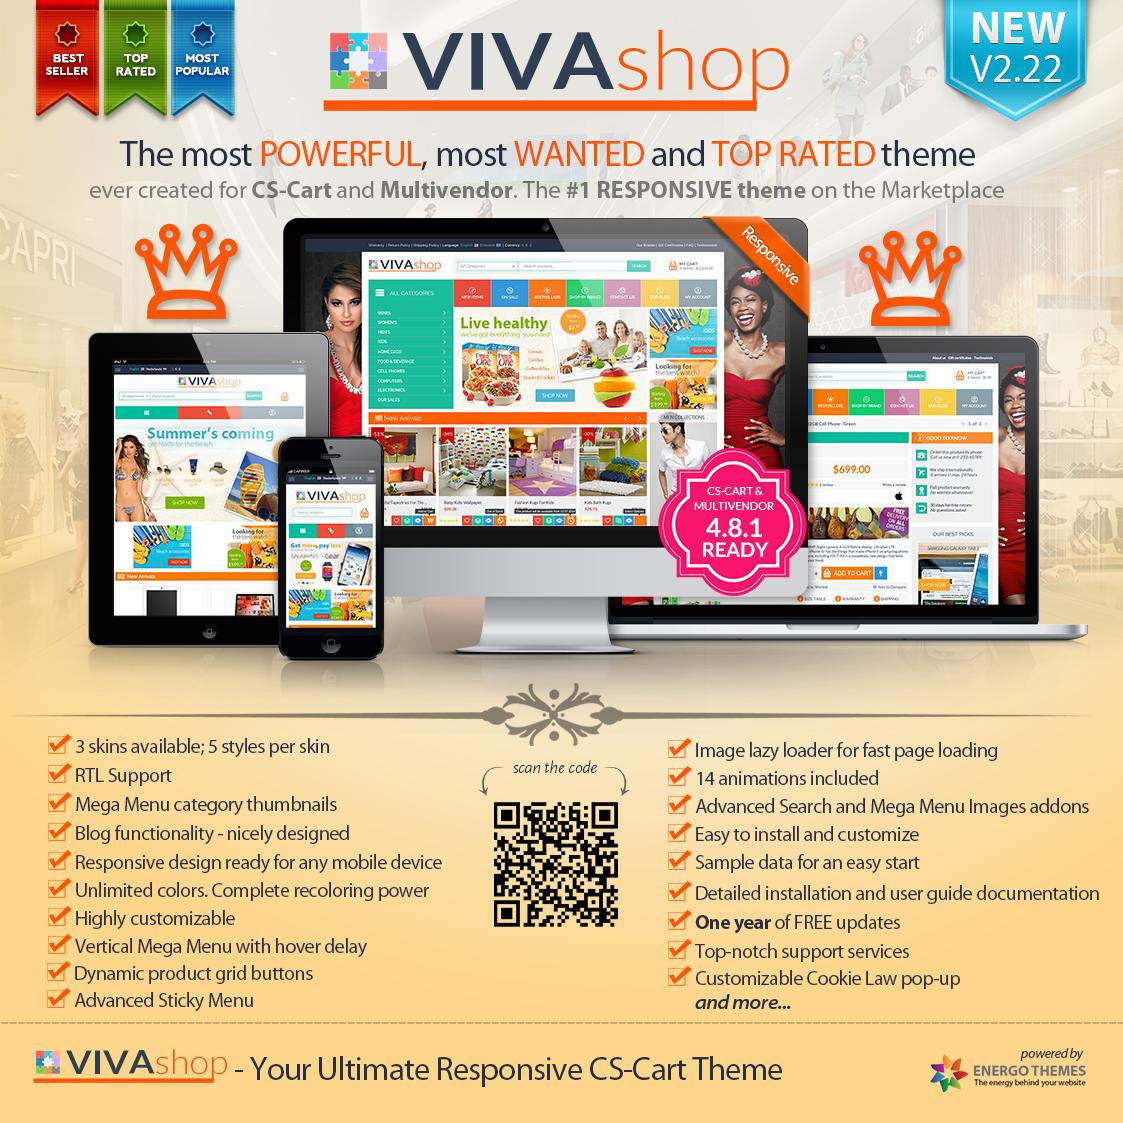 VIVAshop-V2.22-presentation-page-MP.jpg